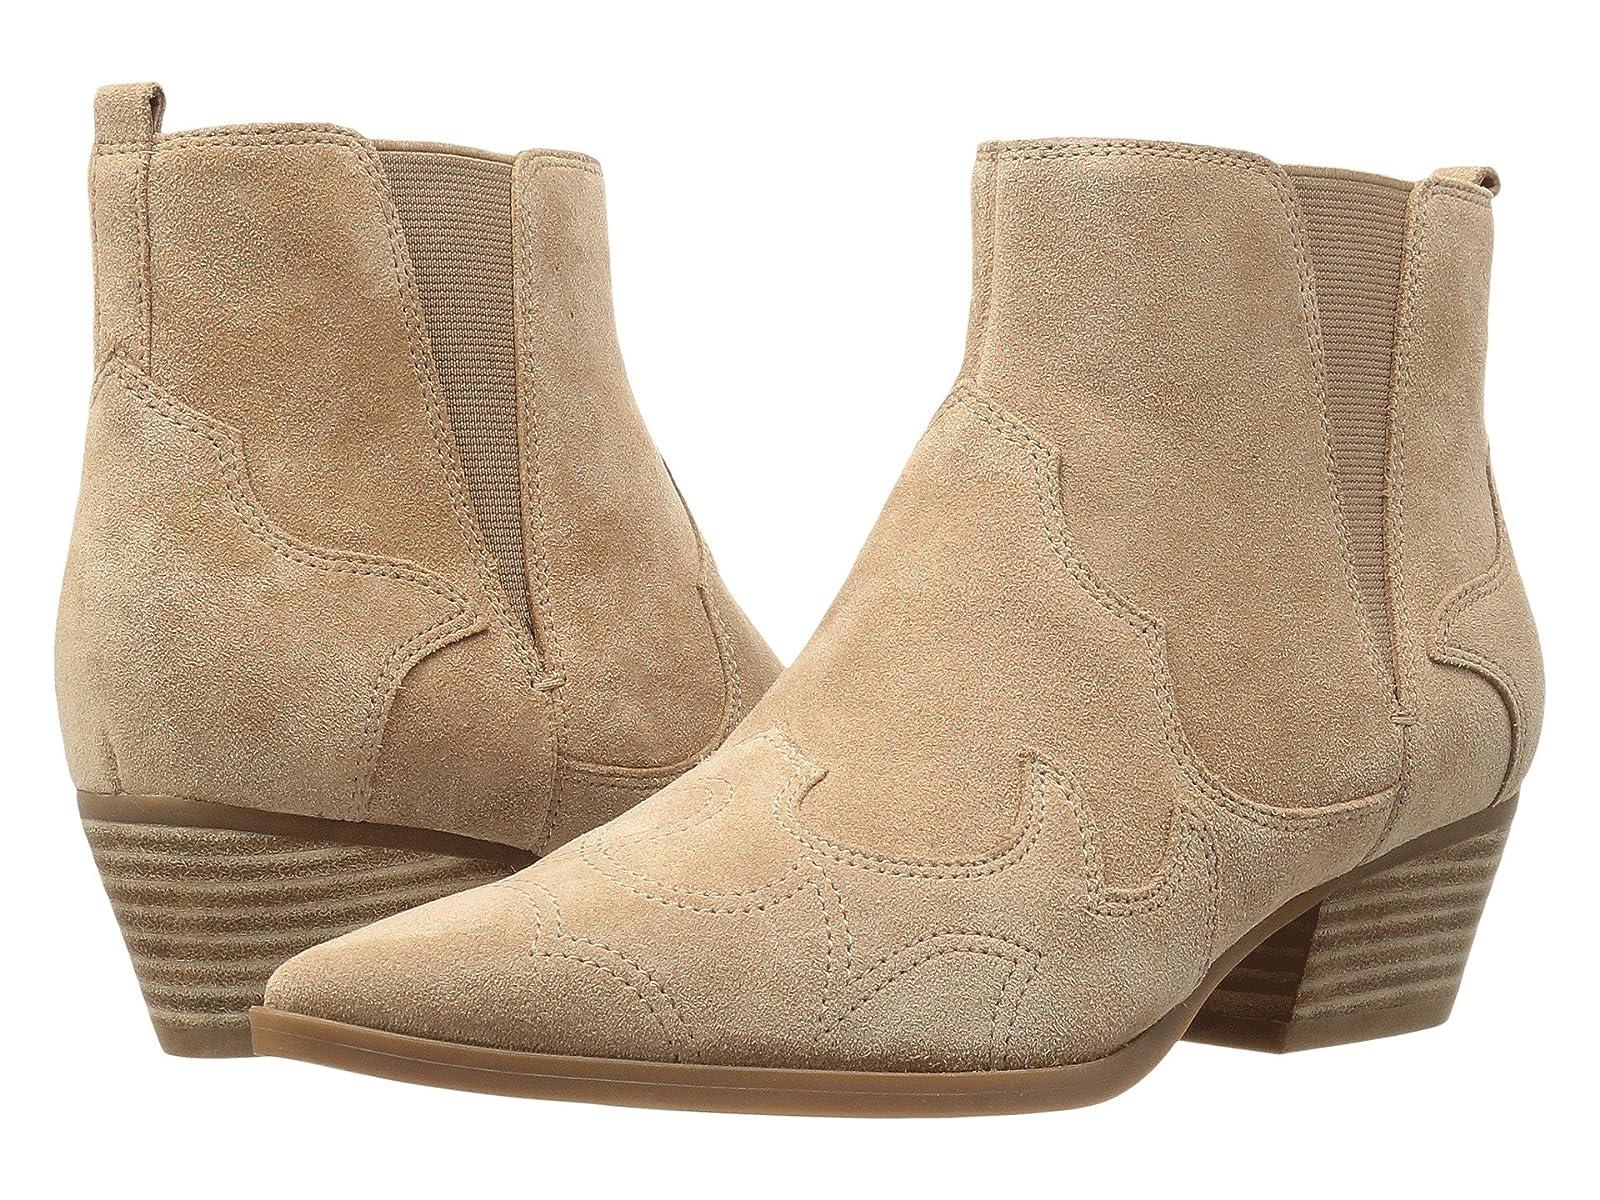 Nine West CedarCheap and distinctive eye-catching shoes